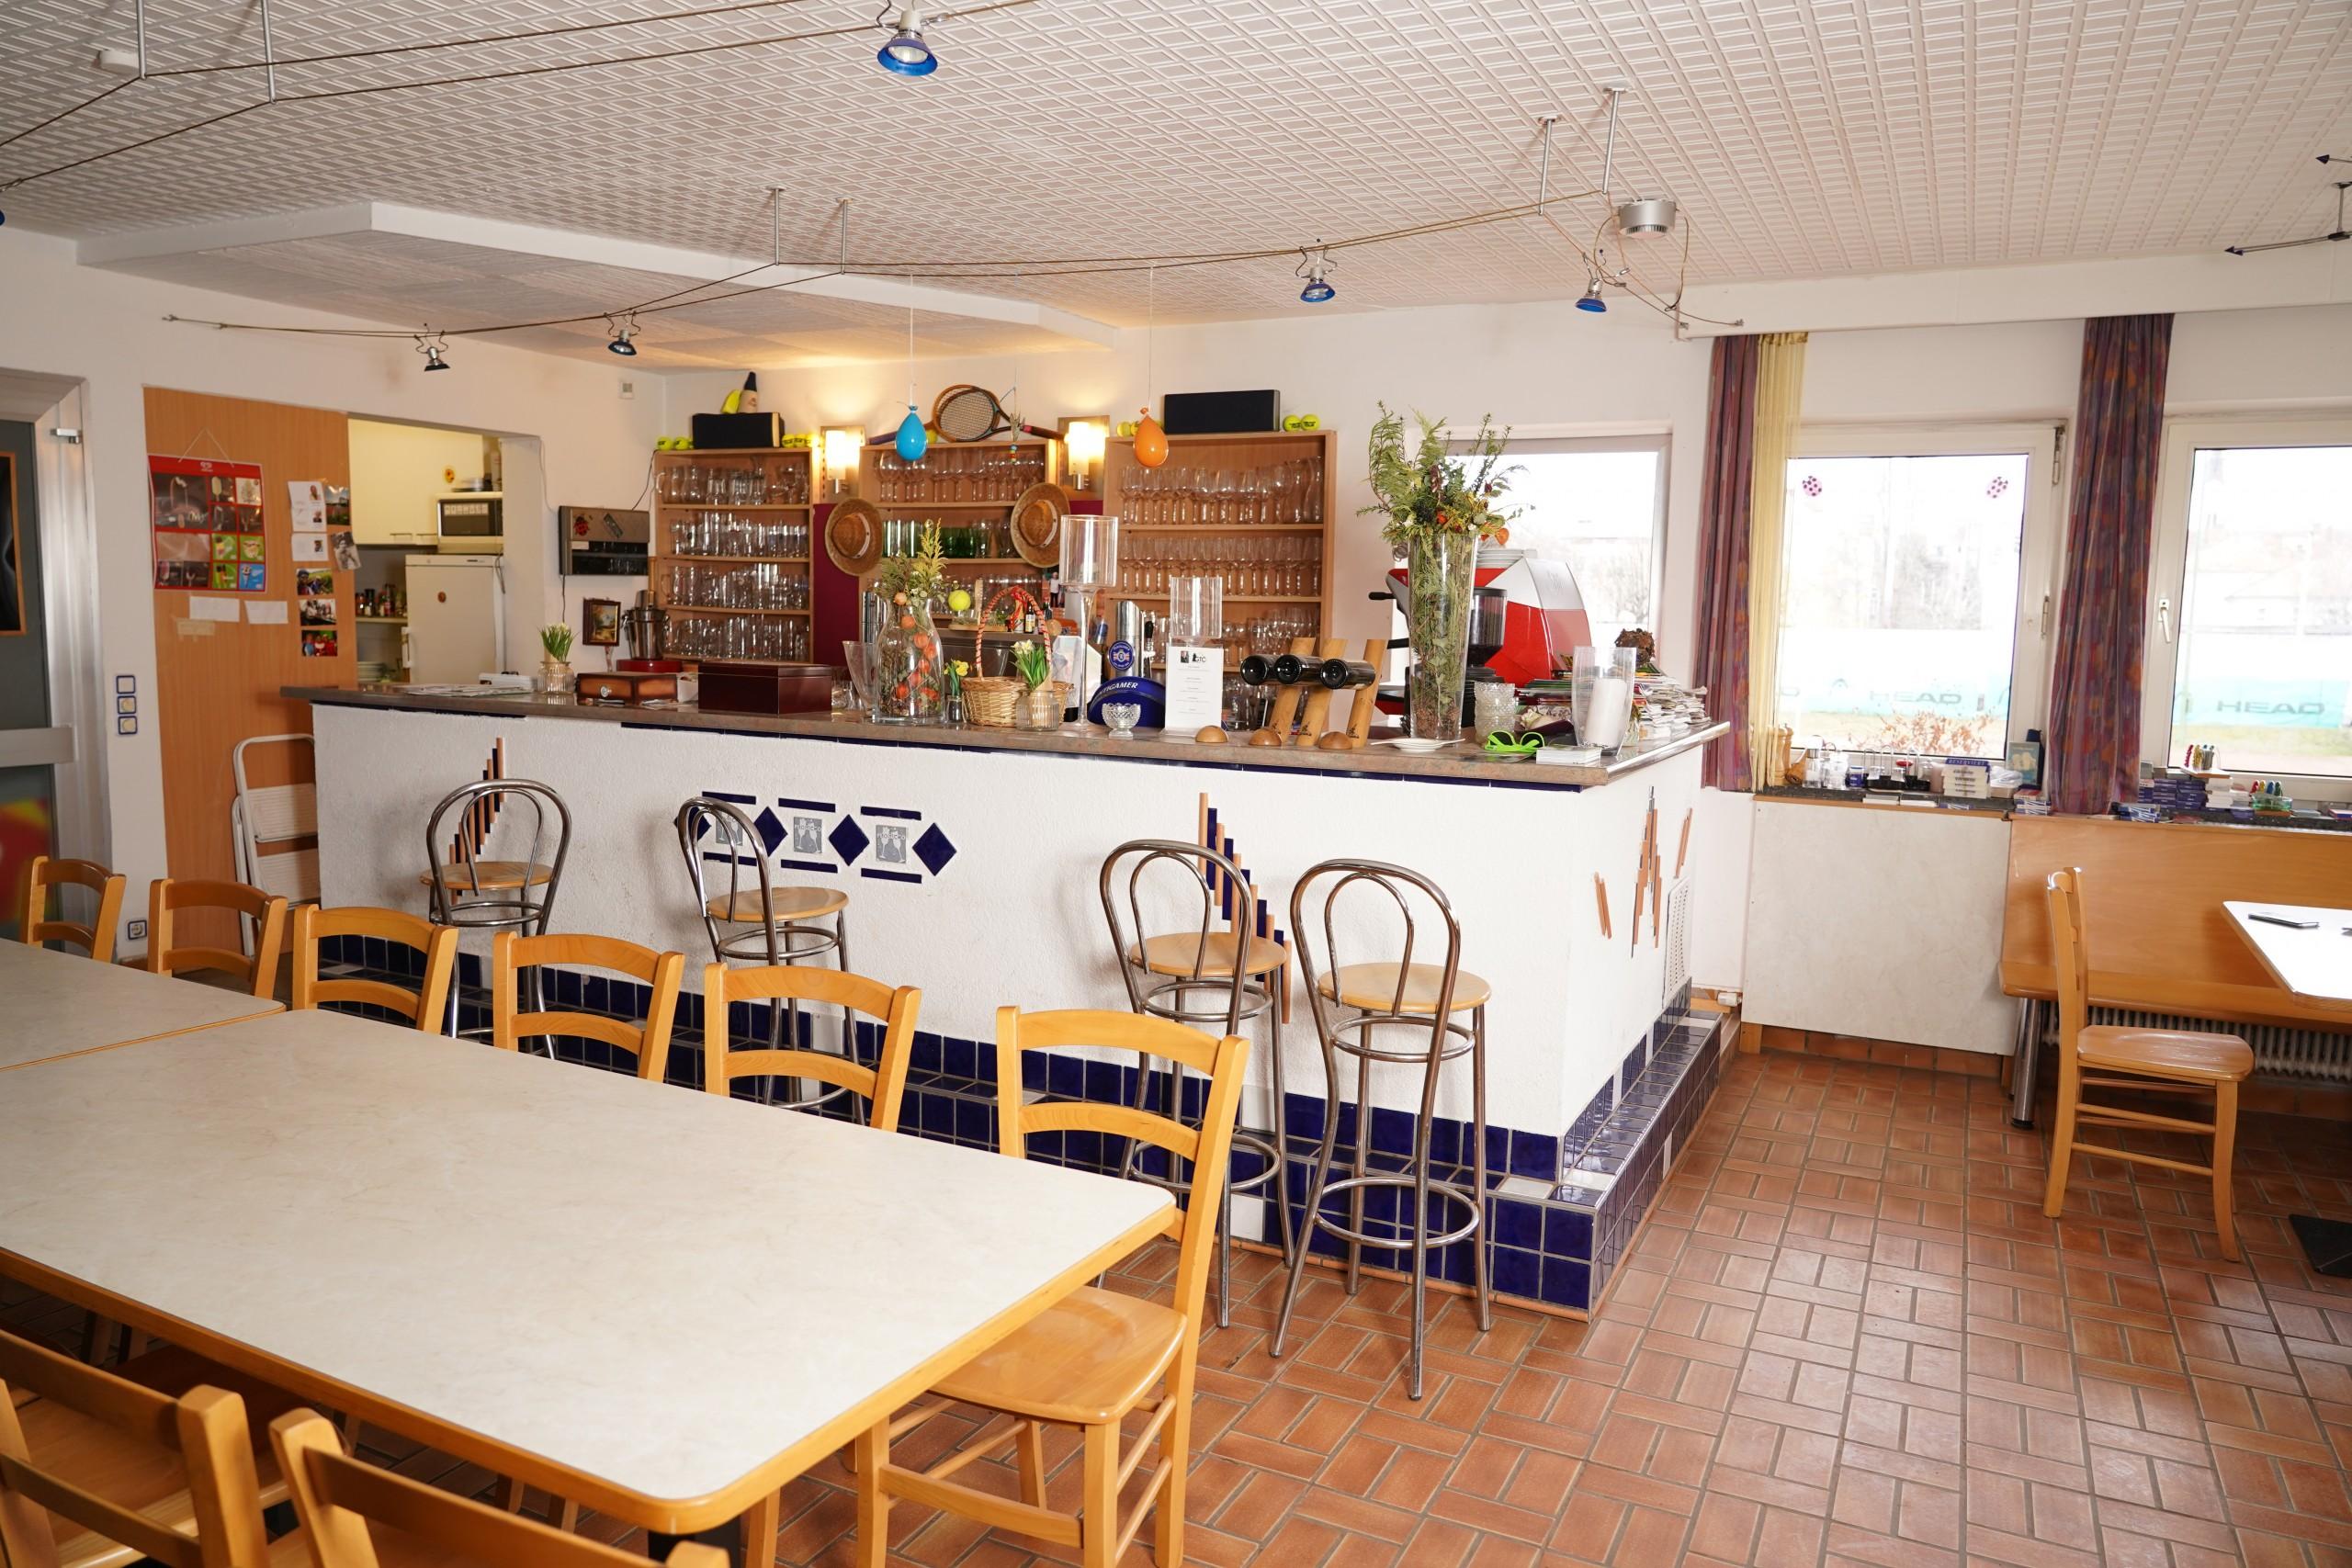 Gastronomie Angebot inkl. Bar